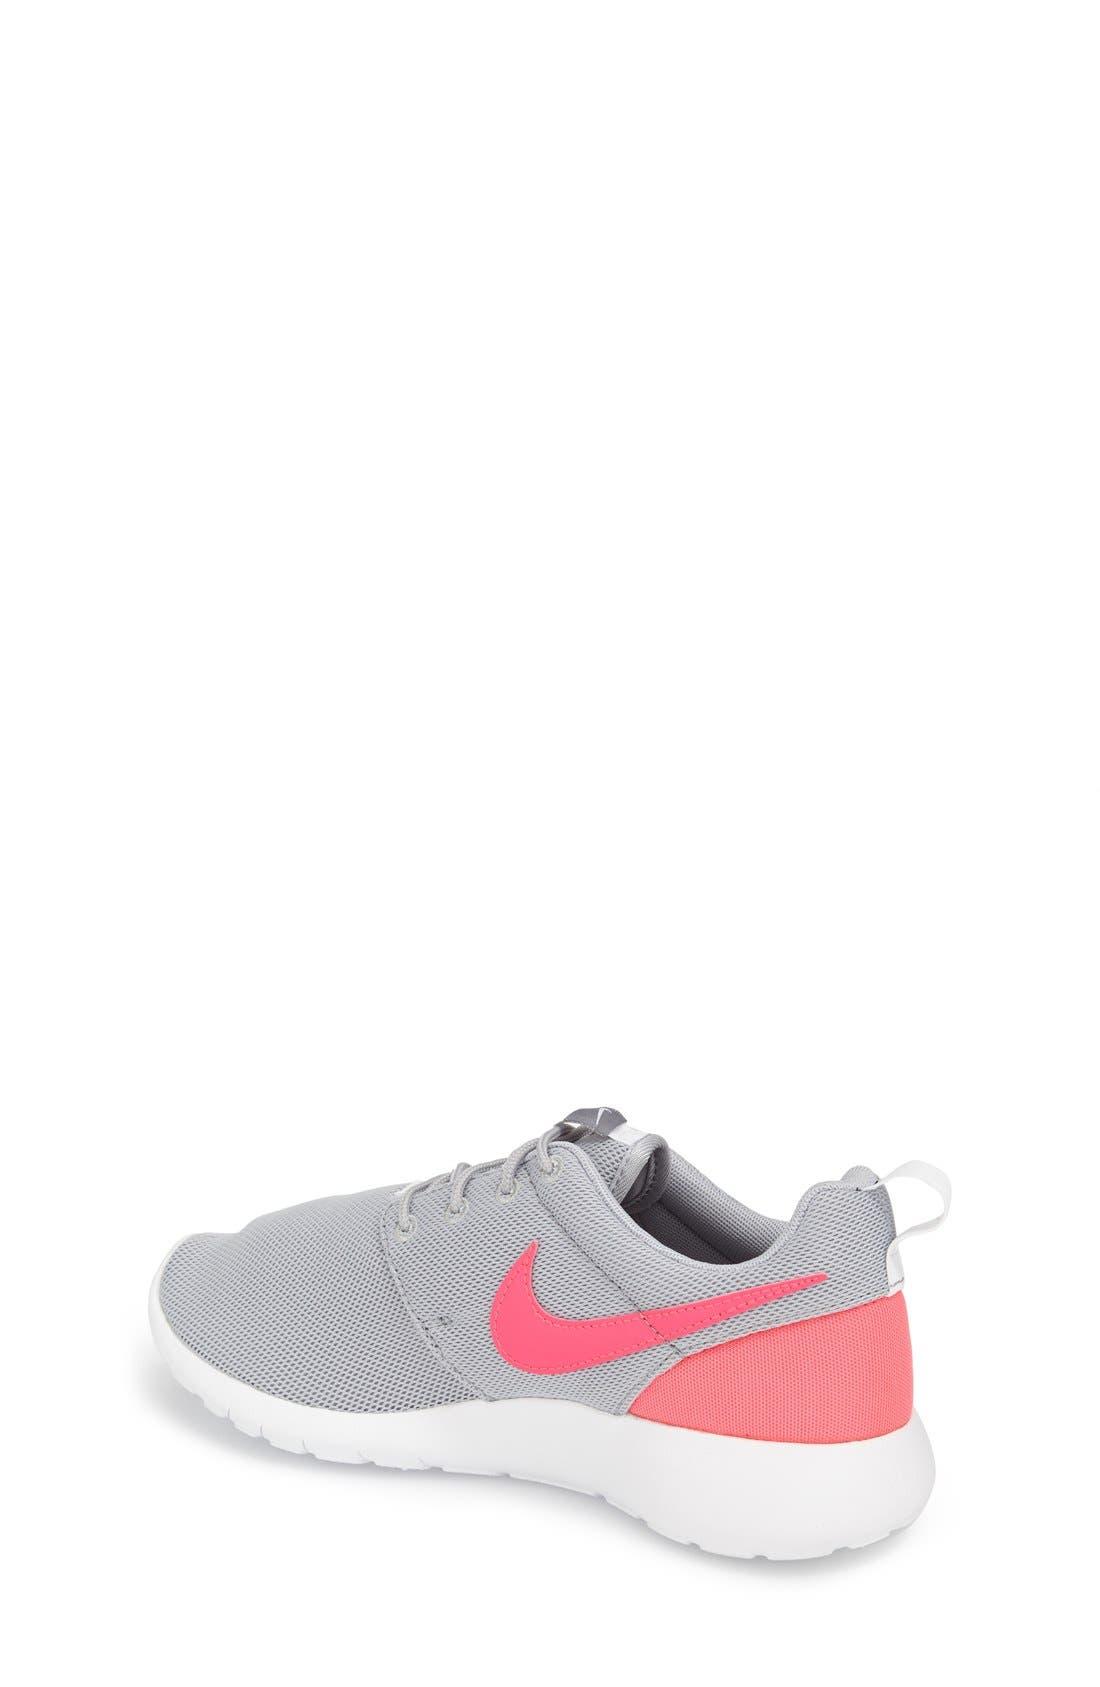 'Roshe Run' Athletic Shoe,                             Alternate thumbnail 123, color,